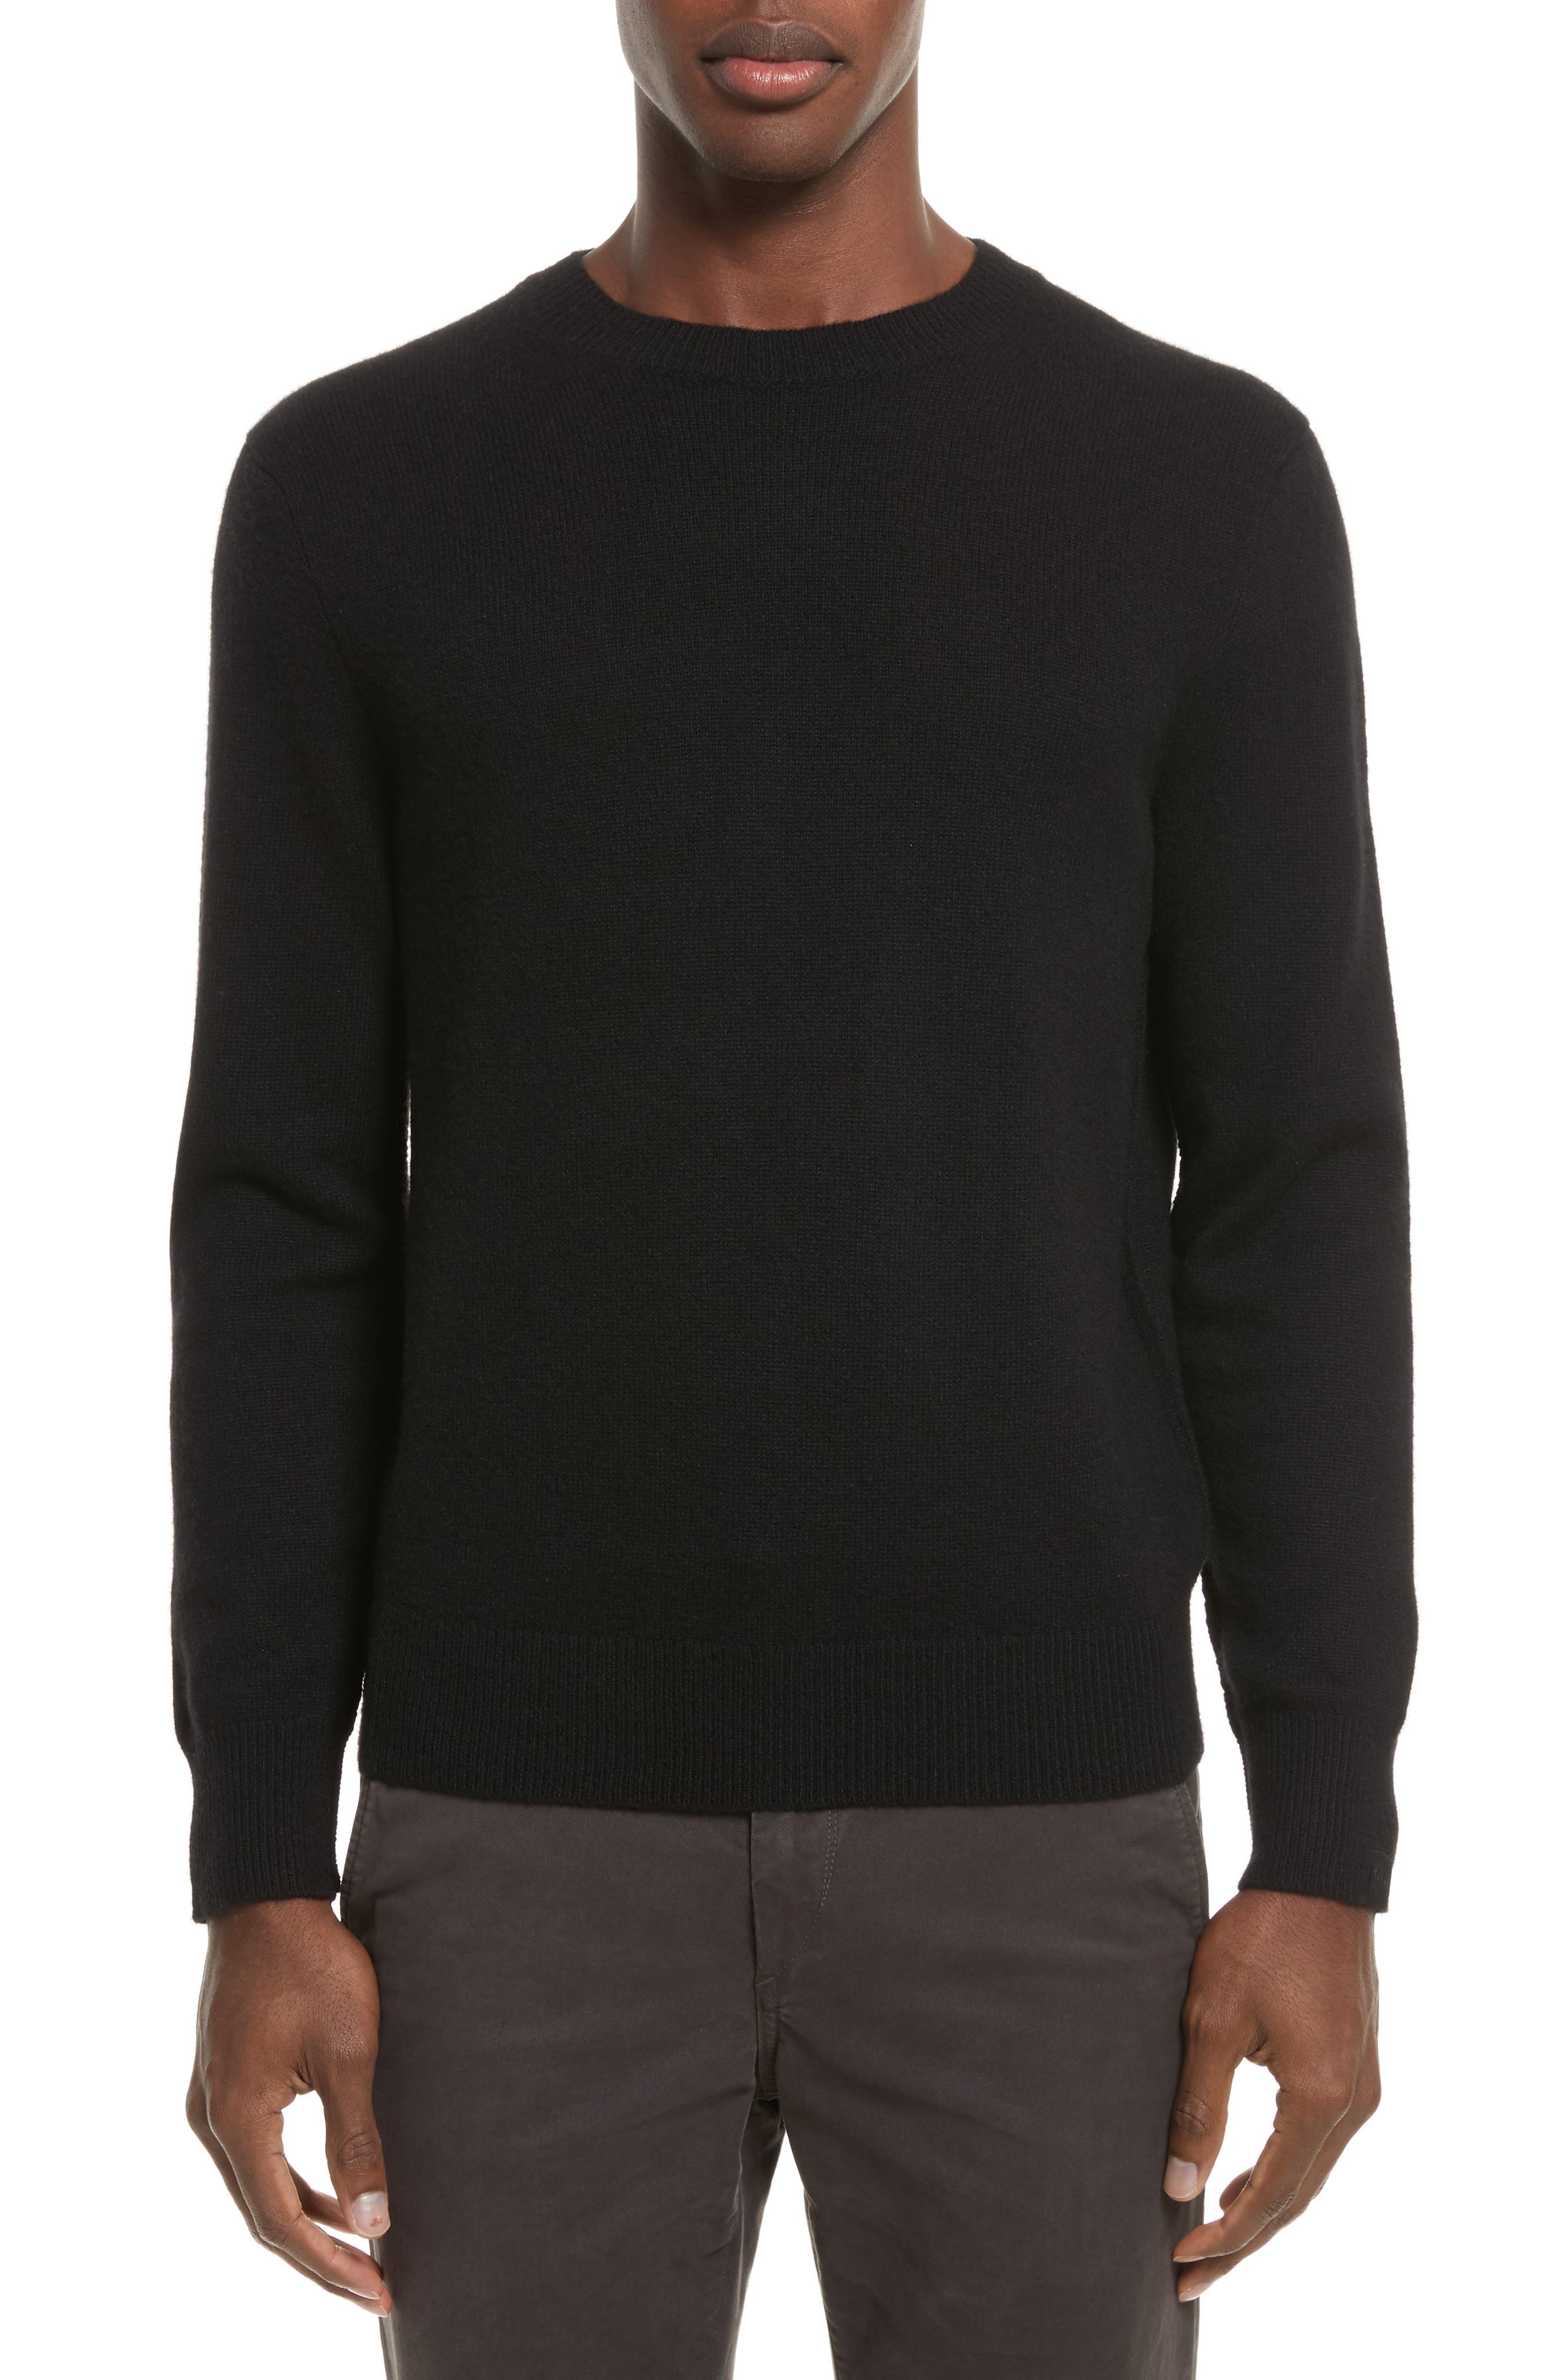 Main Image - rag & bone Haldon Cashmere Crewneck Sweatshirt